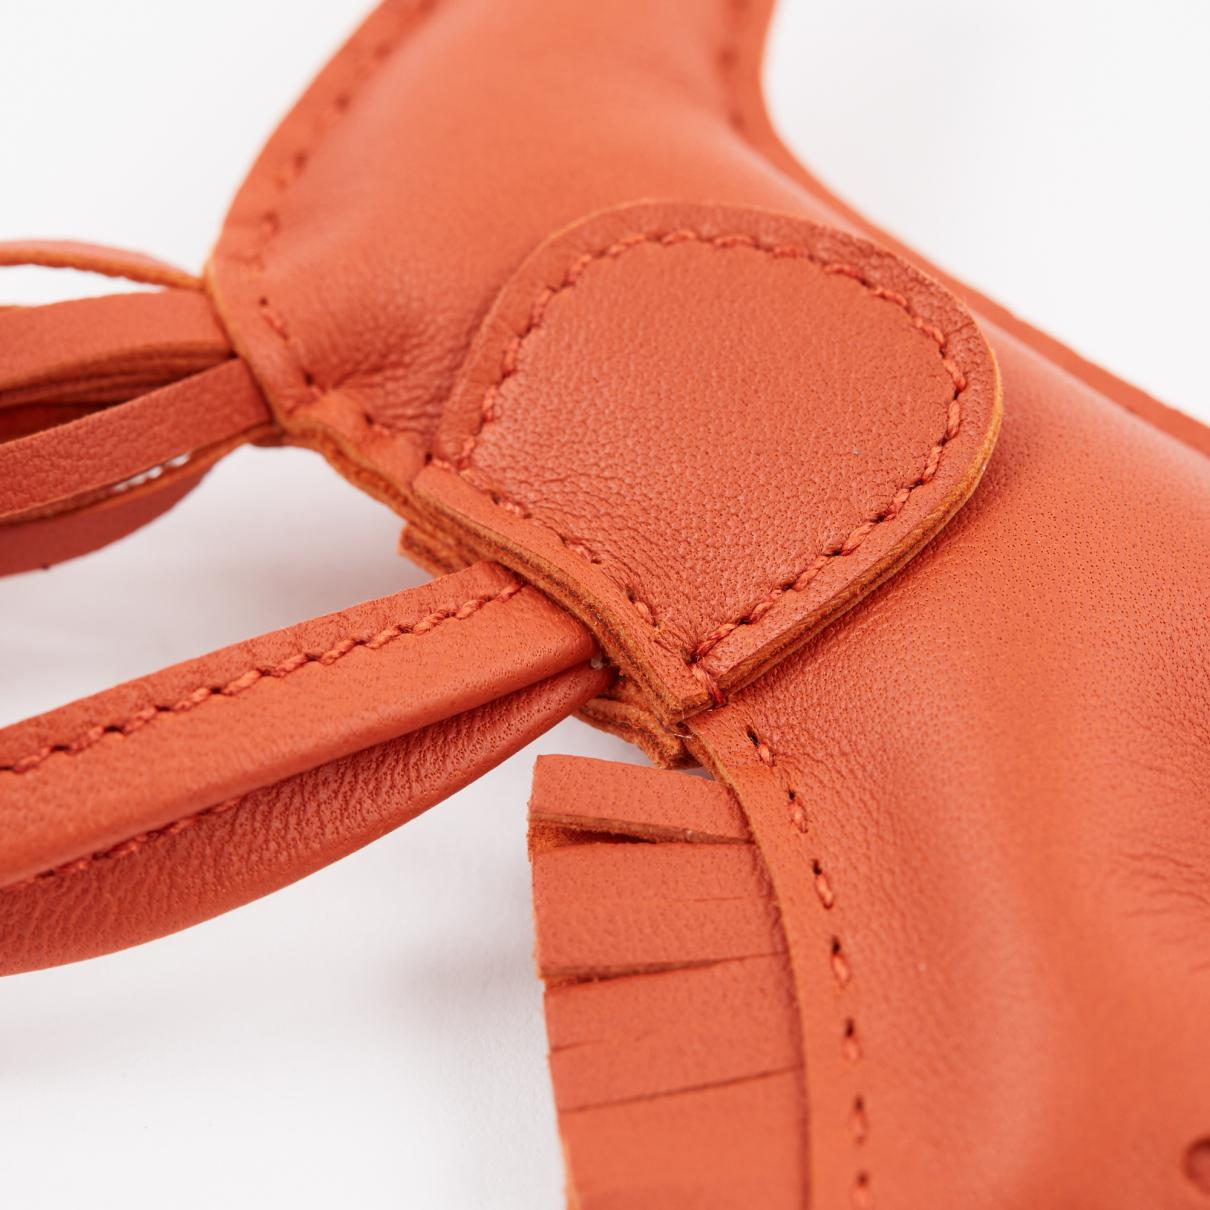 Bijou de sac Rodeo en cuir Cuir Hermès en coloris Orange